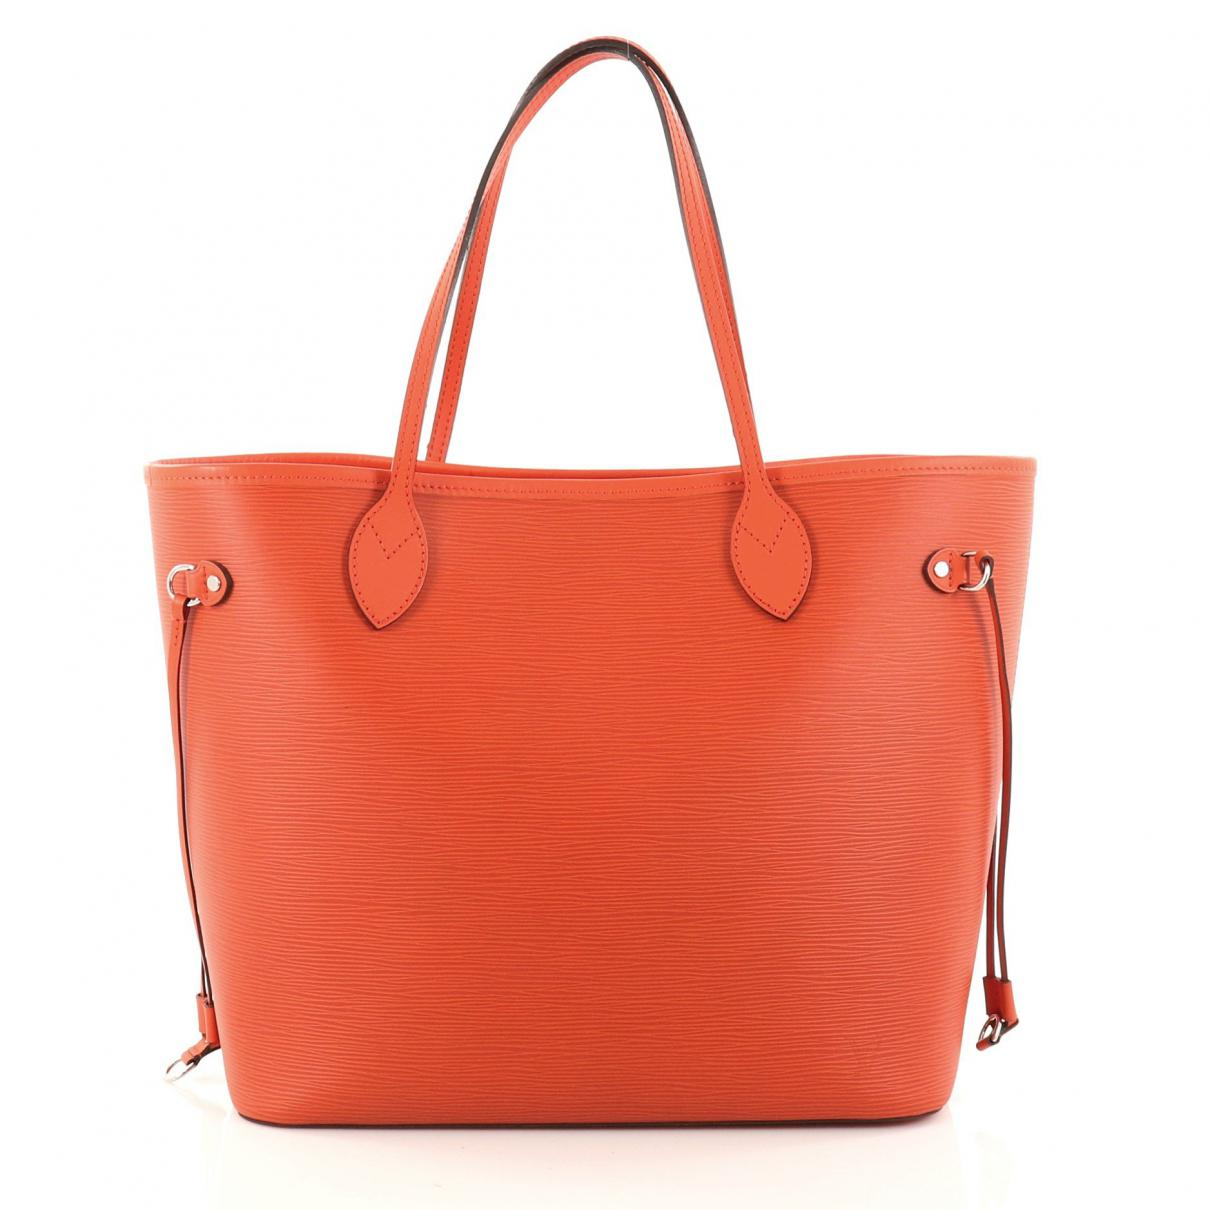 ad4d80234175 Louis Vuitton Pre-owned Orange Leather Handbag in Orange - Lyst